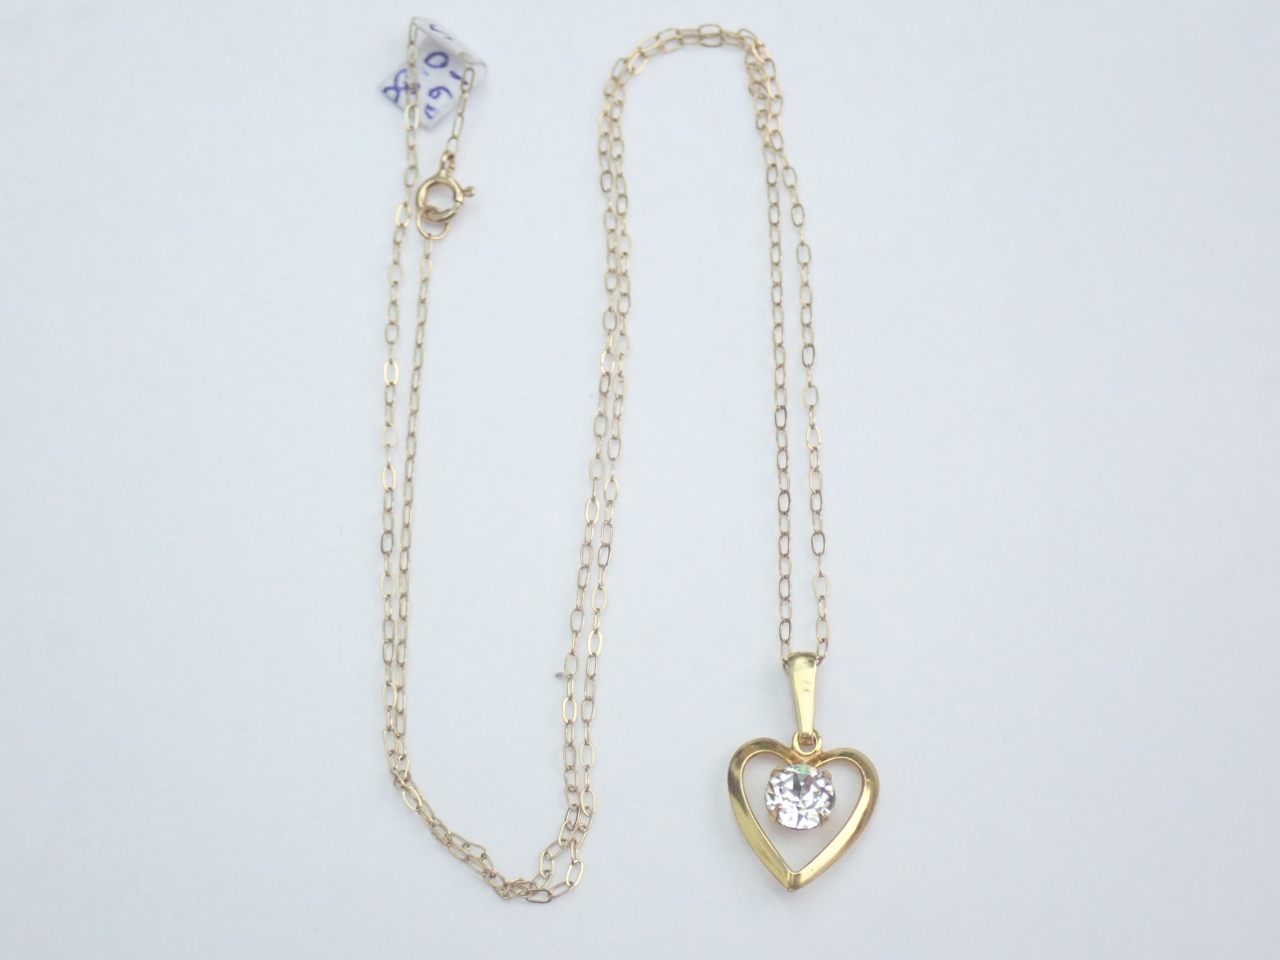 Gold Heart Cubic Zirconia Pendant 375 9k - 16 inch 9k Gold Chain